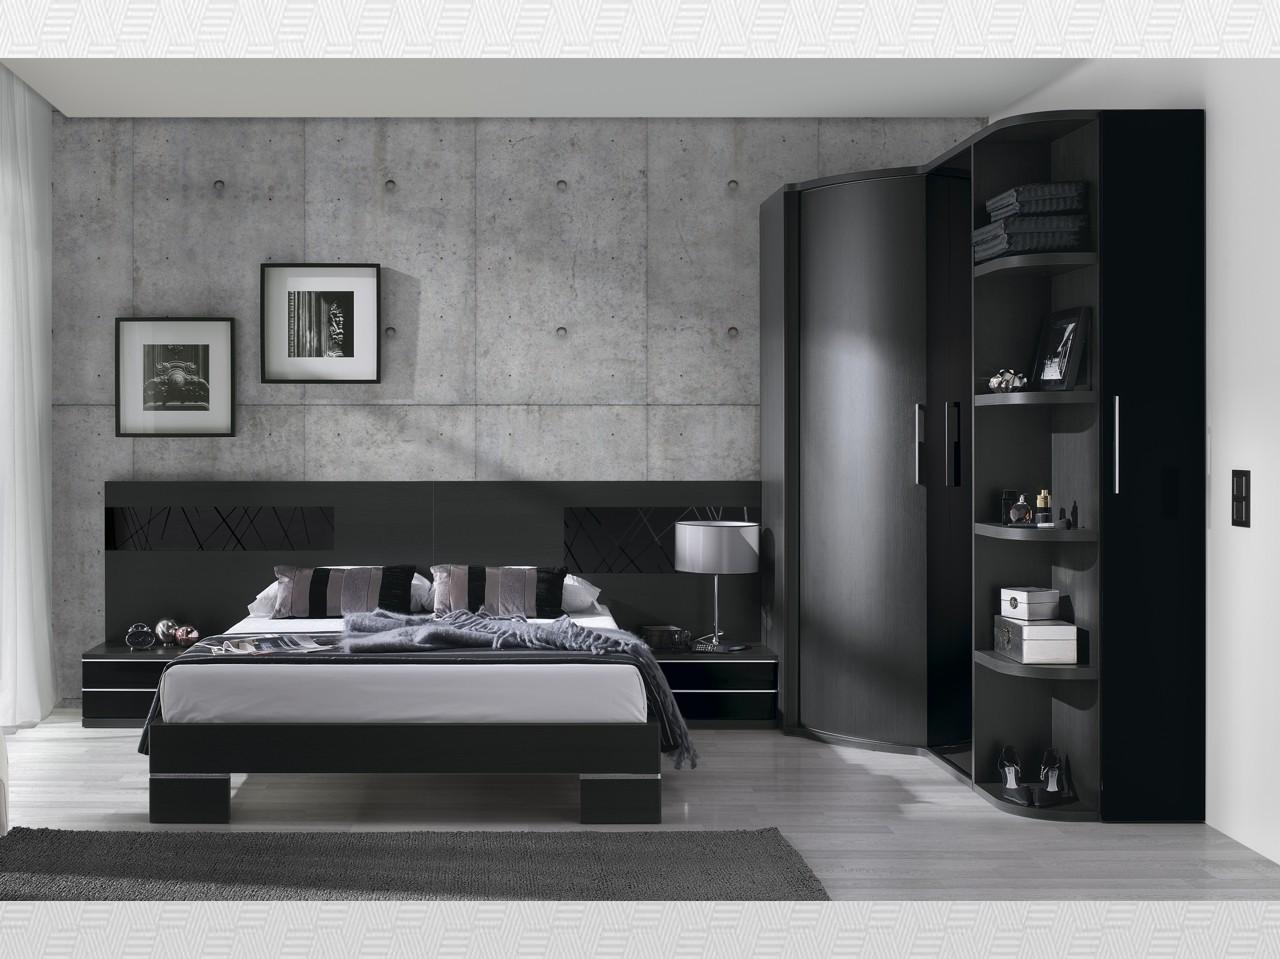 Dormitorio matrimonio Ceniza  negro lacado del modelo Eos